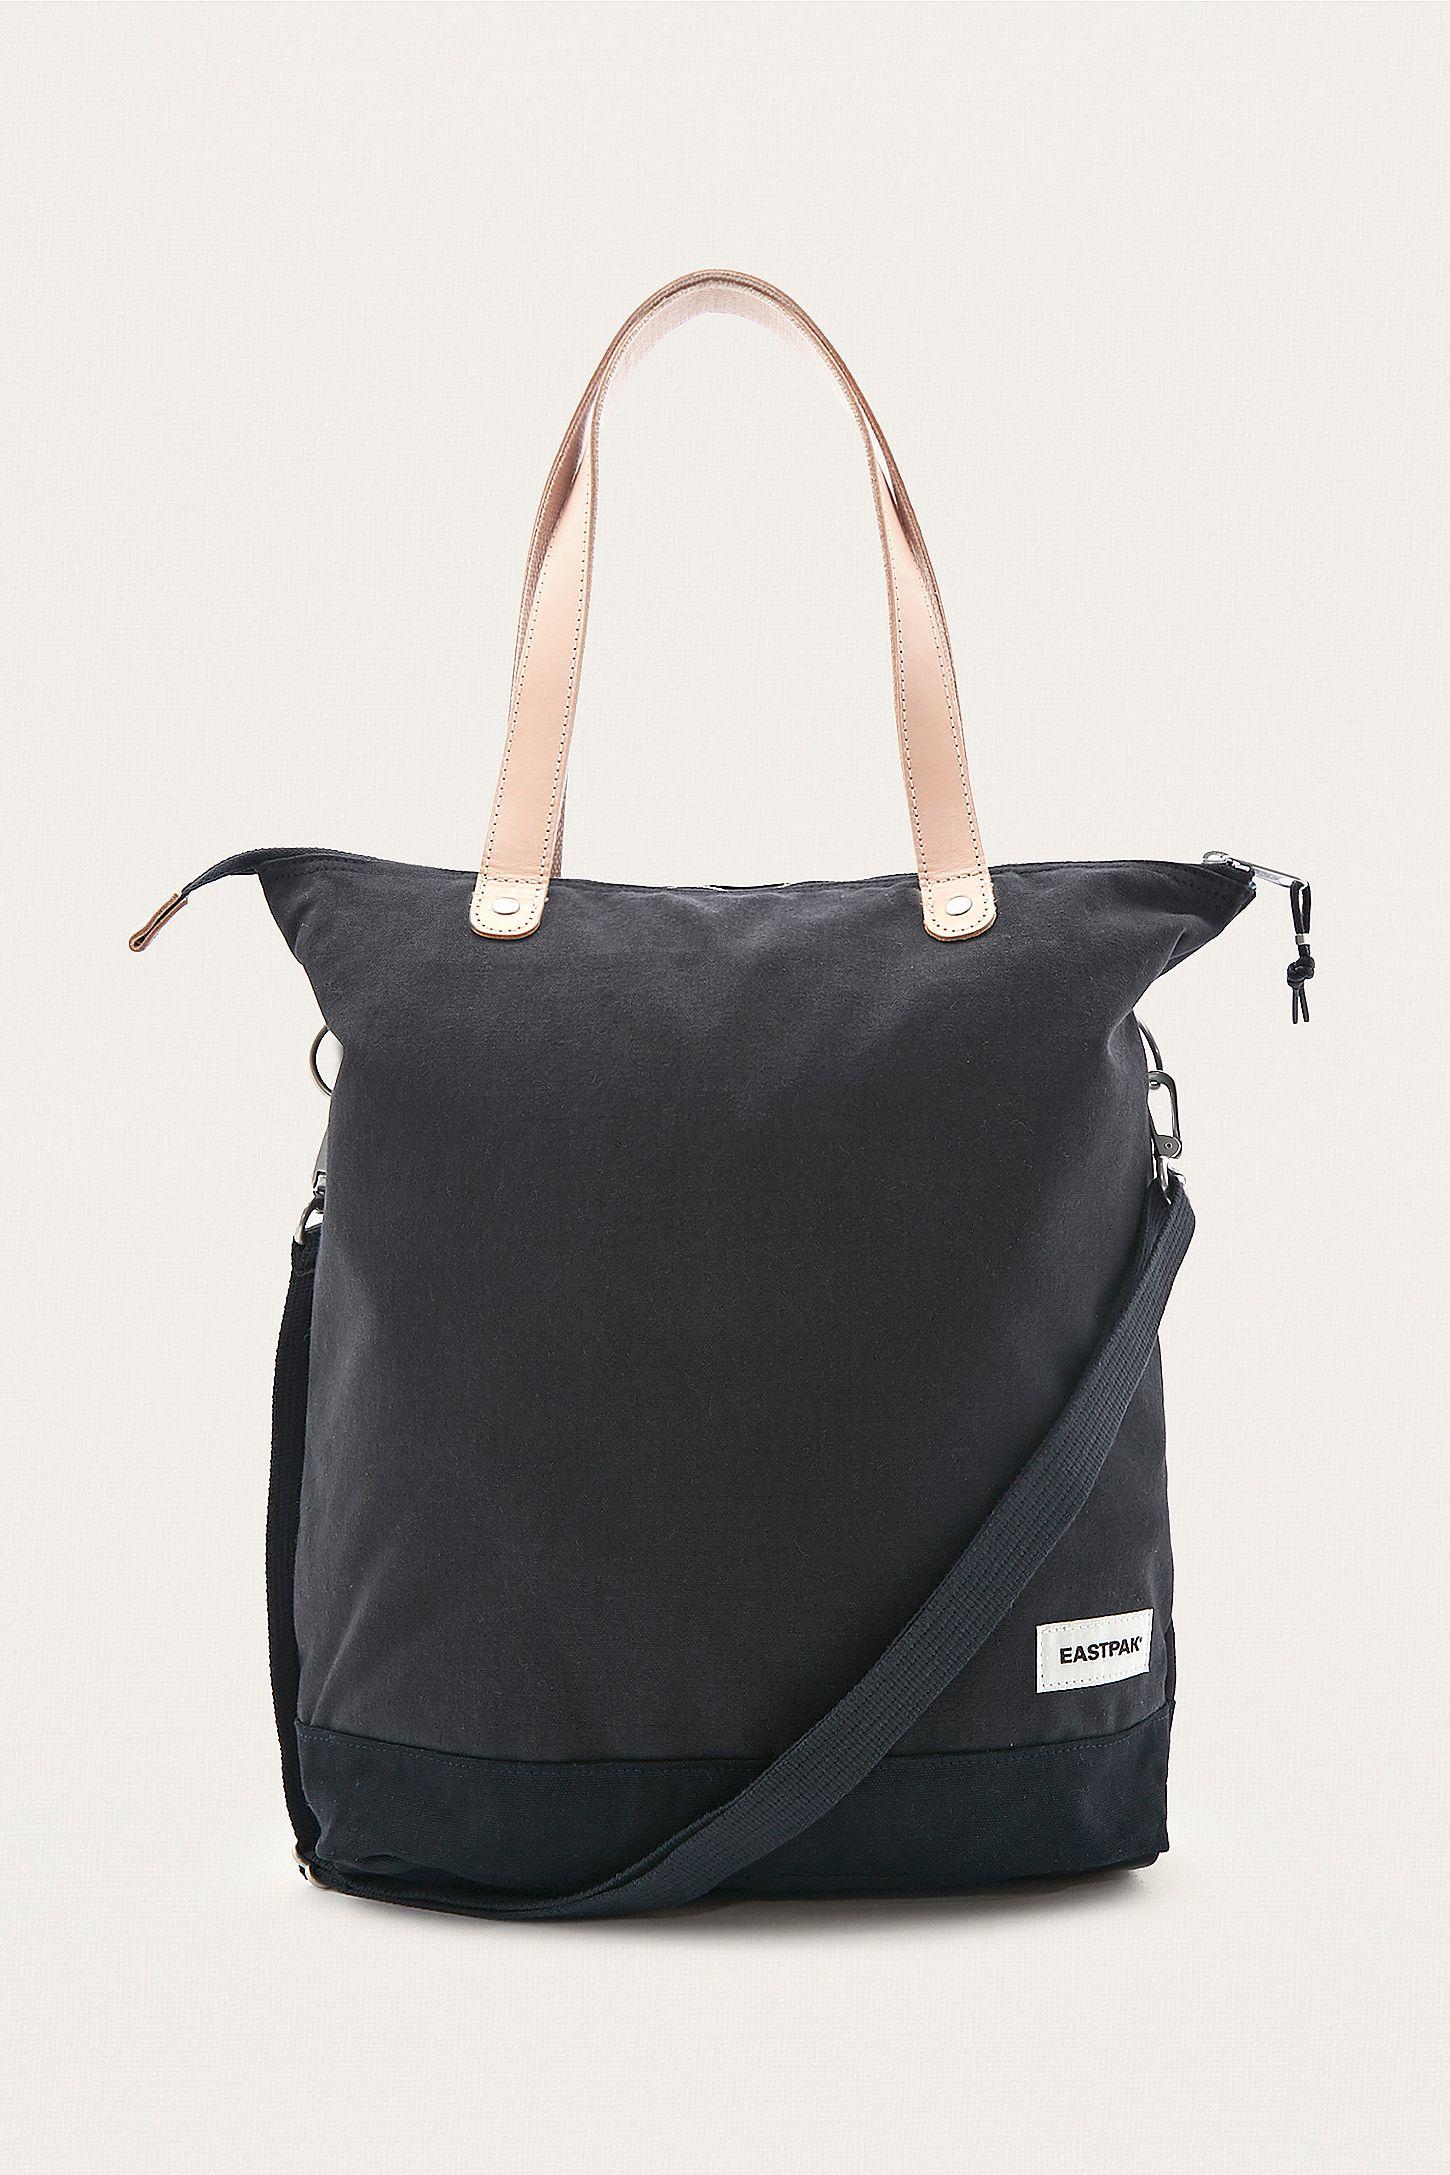 Eastpak Soukie Superb Black Canvas Tote Back  7e95f69513